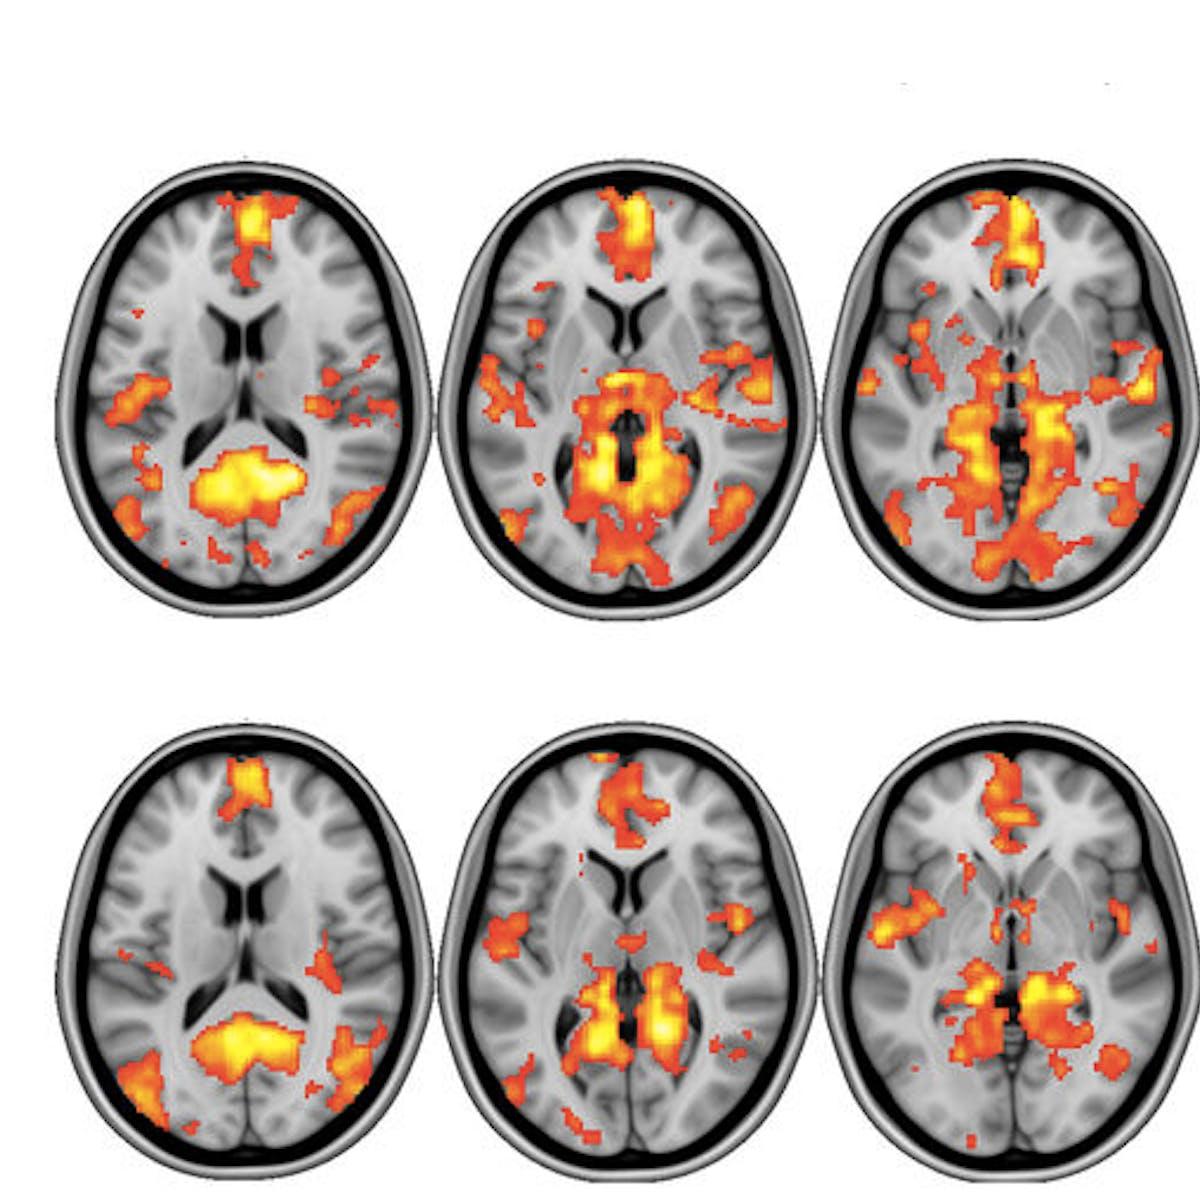 Psilocybin in Magic Mushrooms Hits Brain's 'Reset' Button, Say Scientists